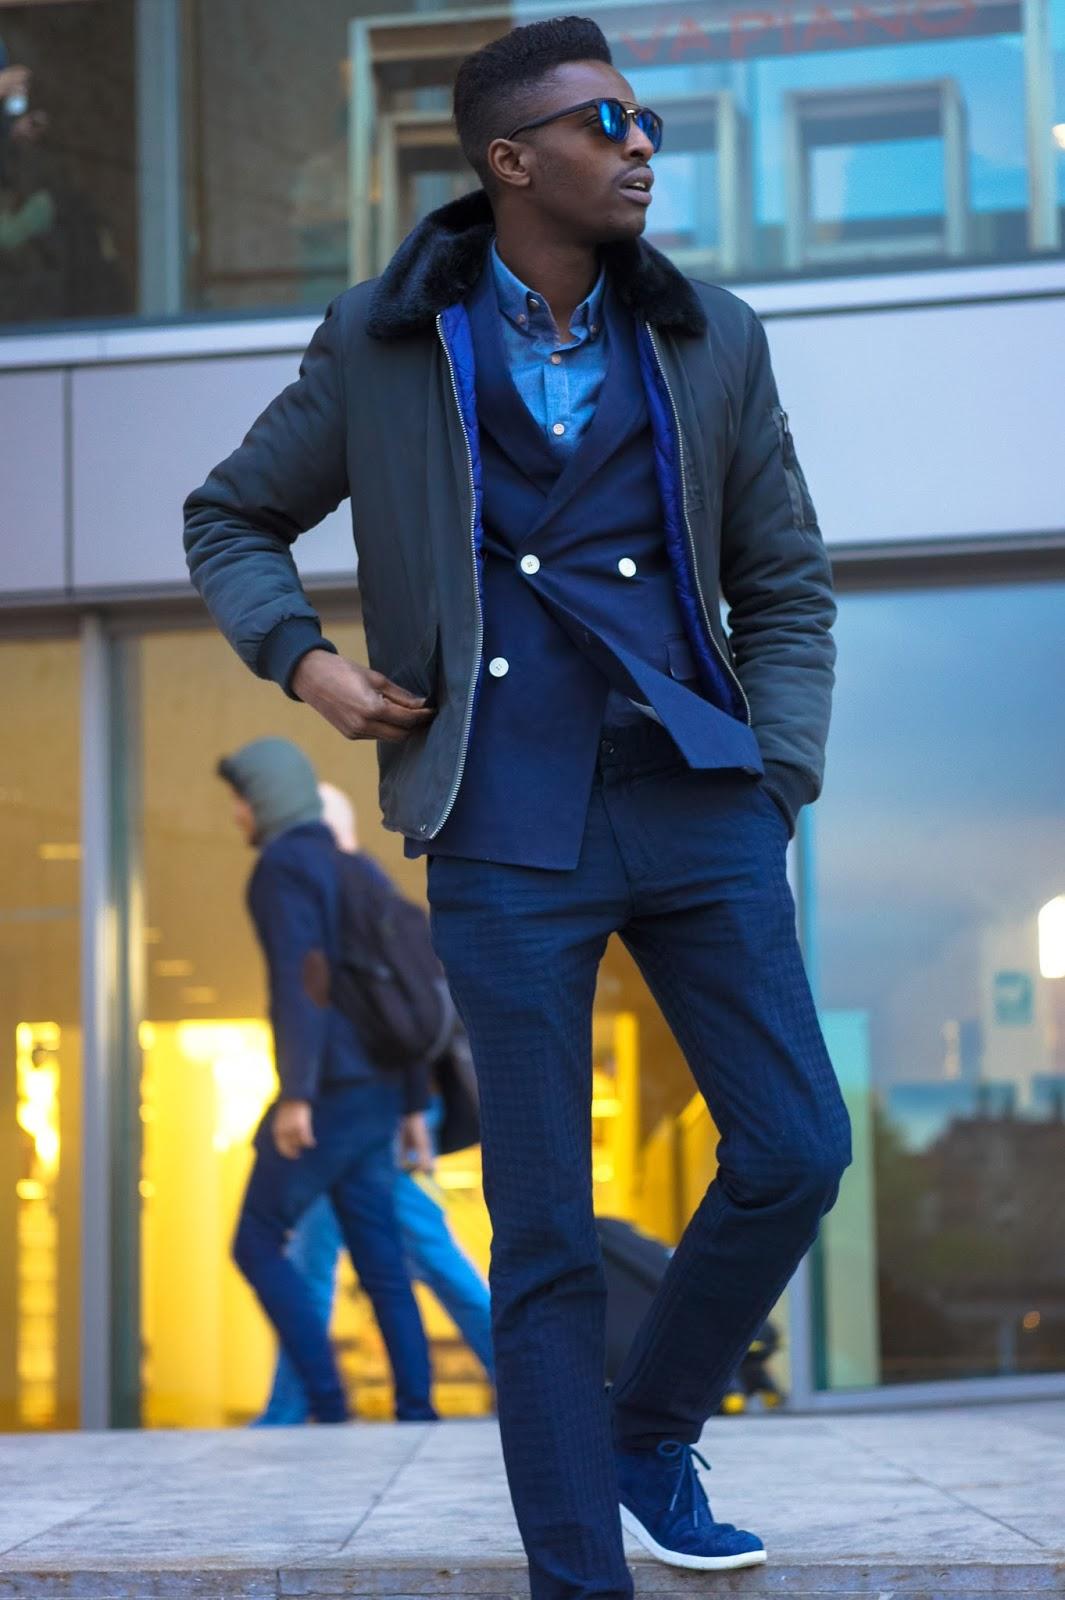 jonthegold blog x its true blog - navy blue looks style fashion as celebration for nationale dag van de communicatie in amsterdam near vapiano central station - ugg sneakers zara pants h&m blazer crisitano ronaldo cr7 menswear fashion bloggers united